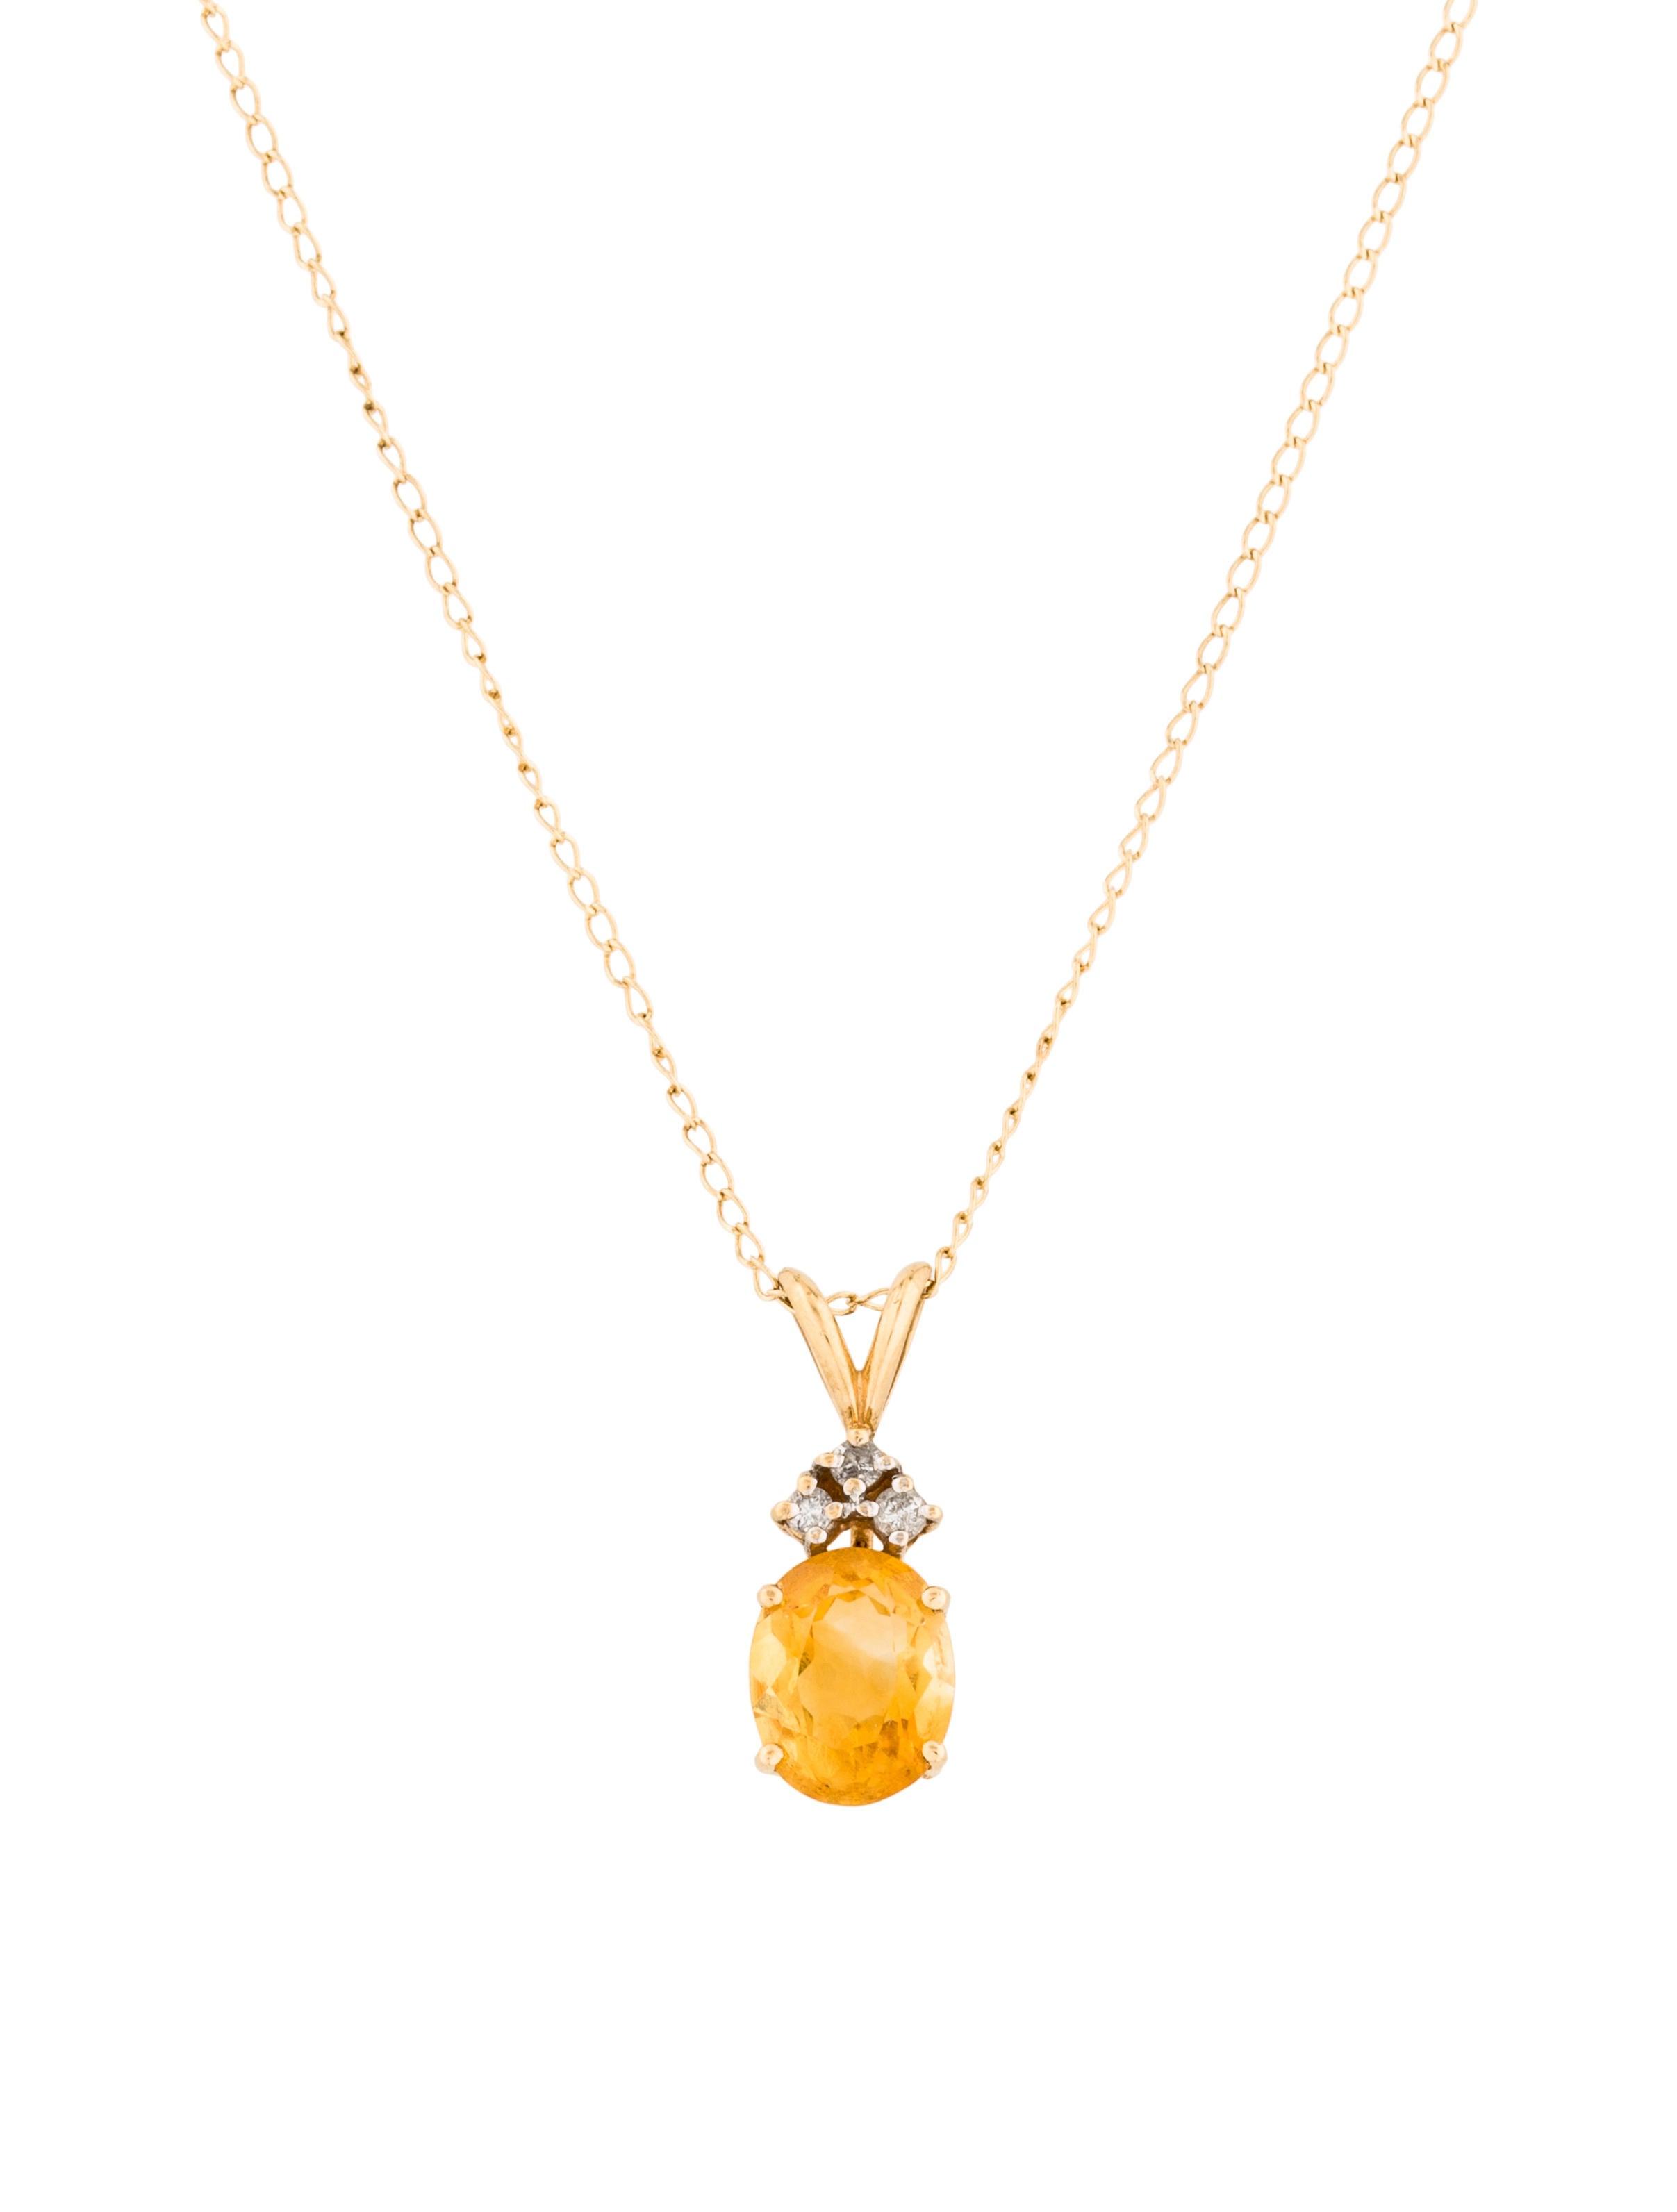 14k diamond amp citrine pendant necklace necklaces